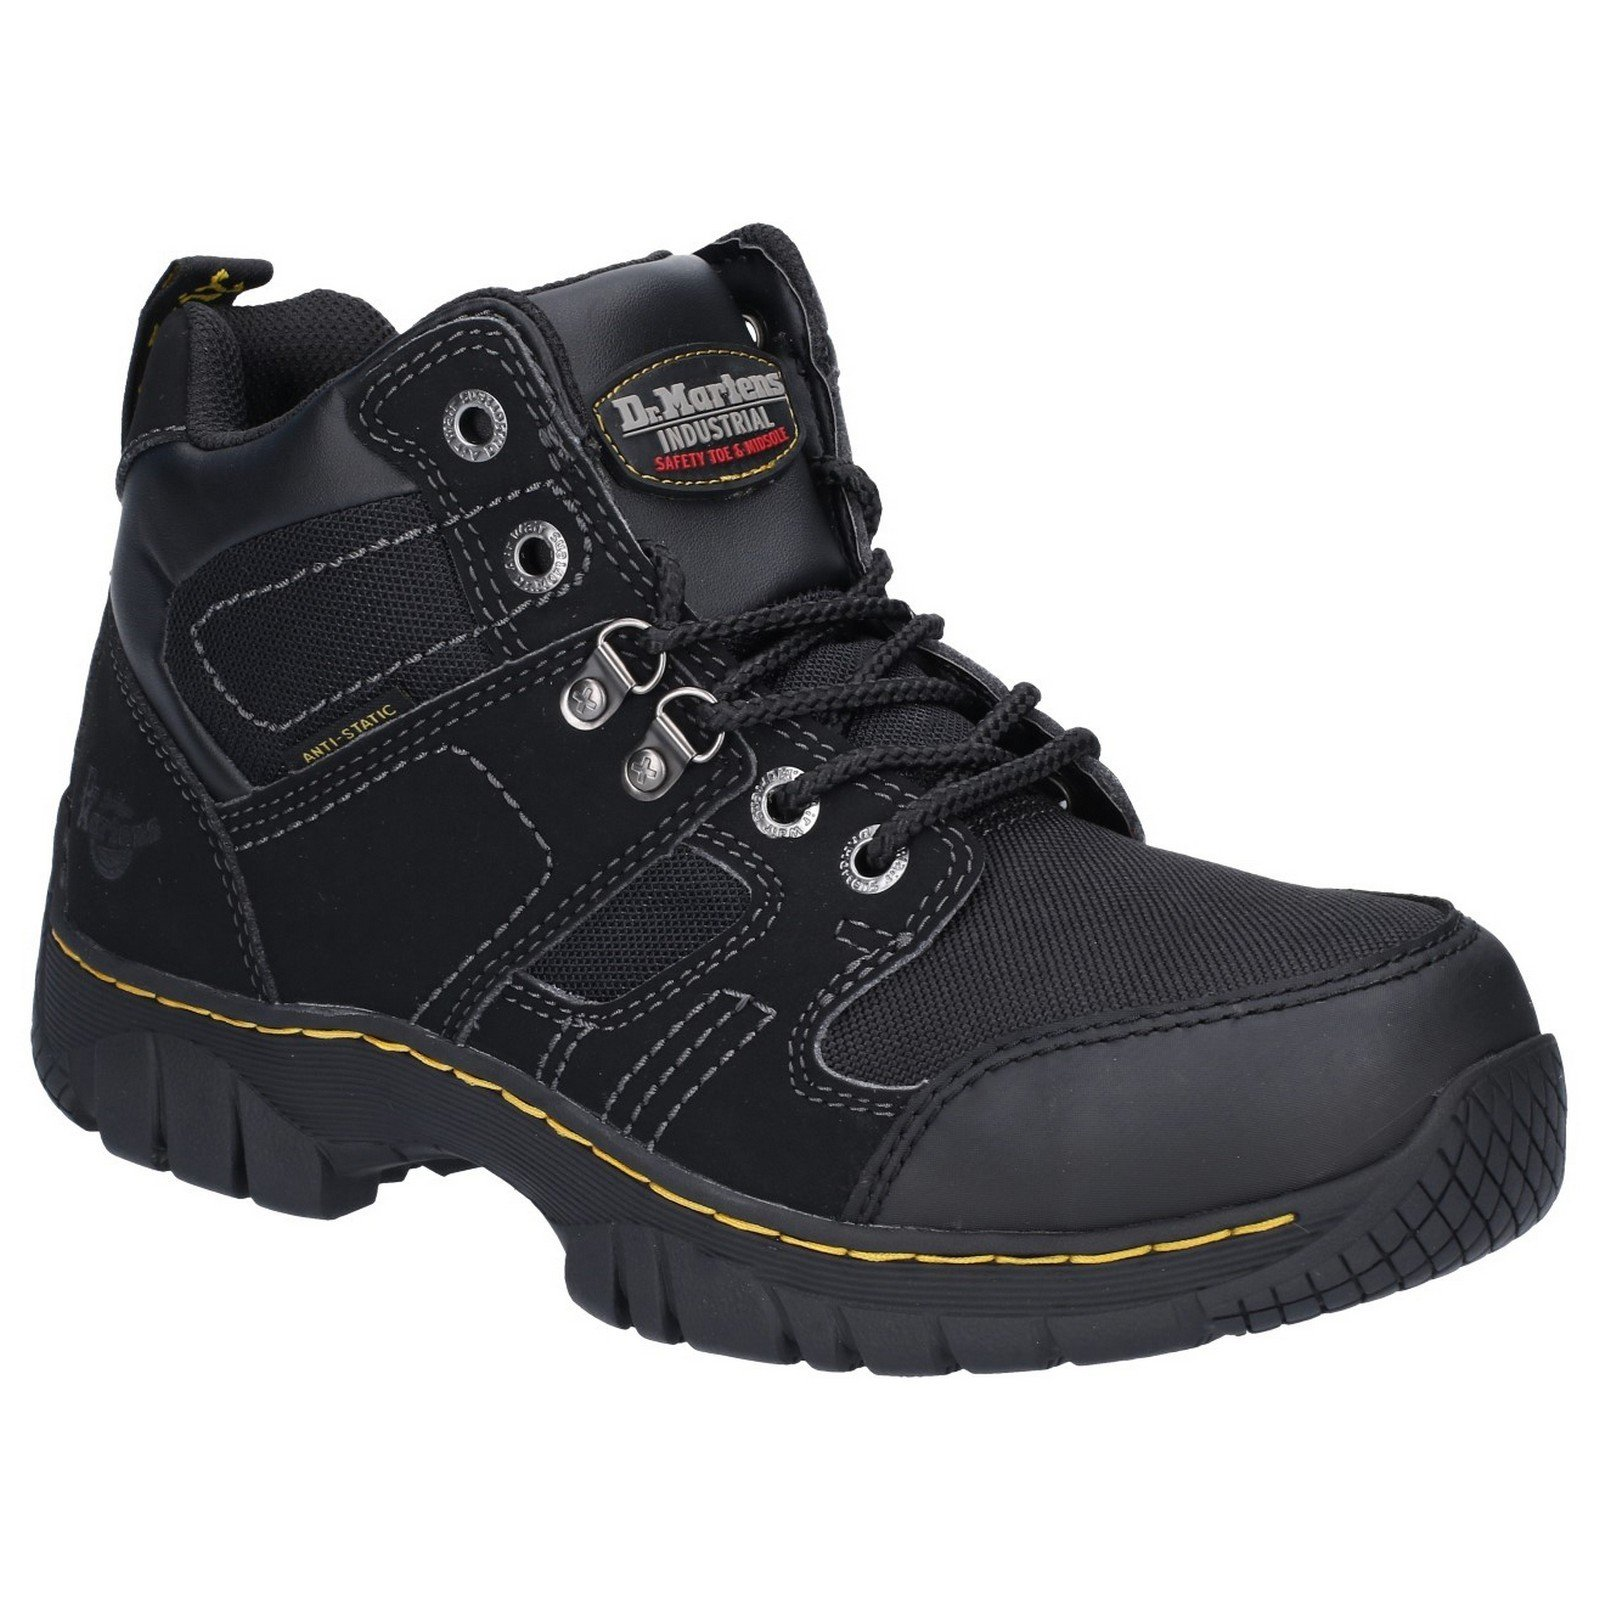 Dr Martens Unisex Benham Safety Boots Black 21647-34773 - Black 10